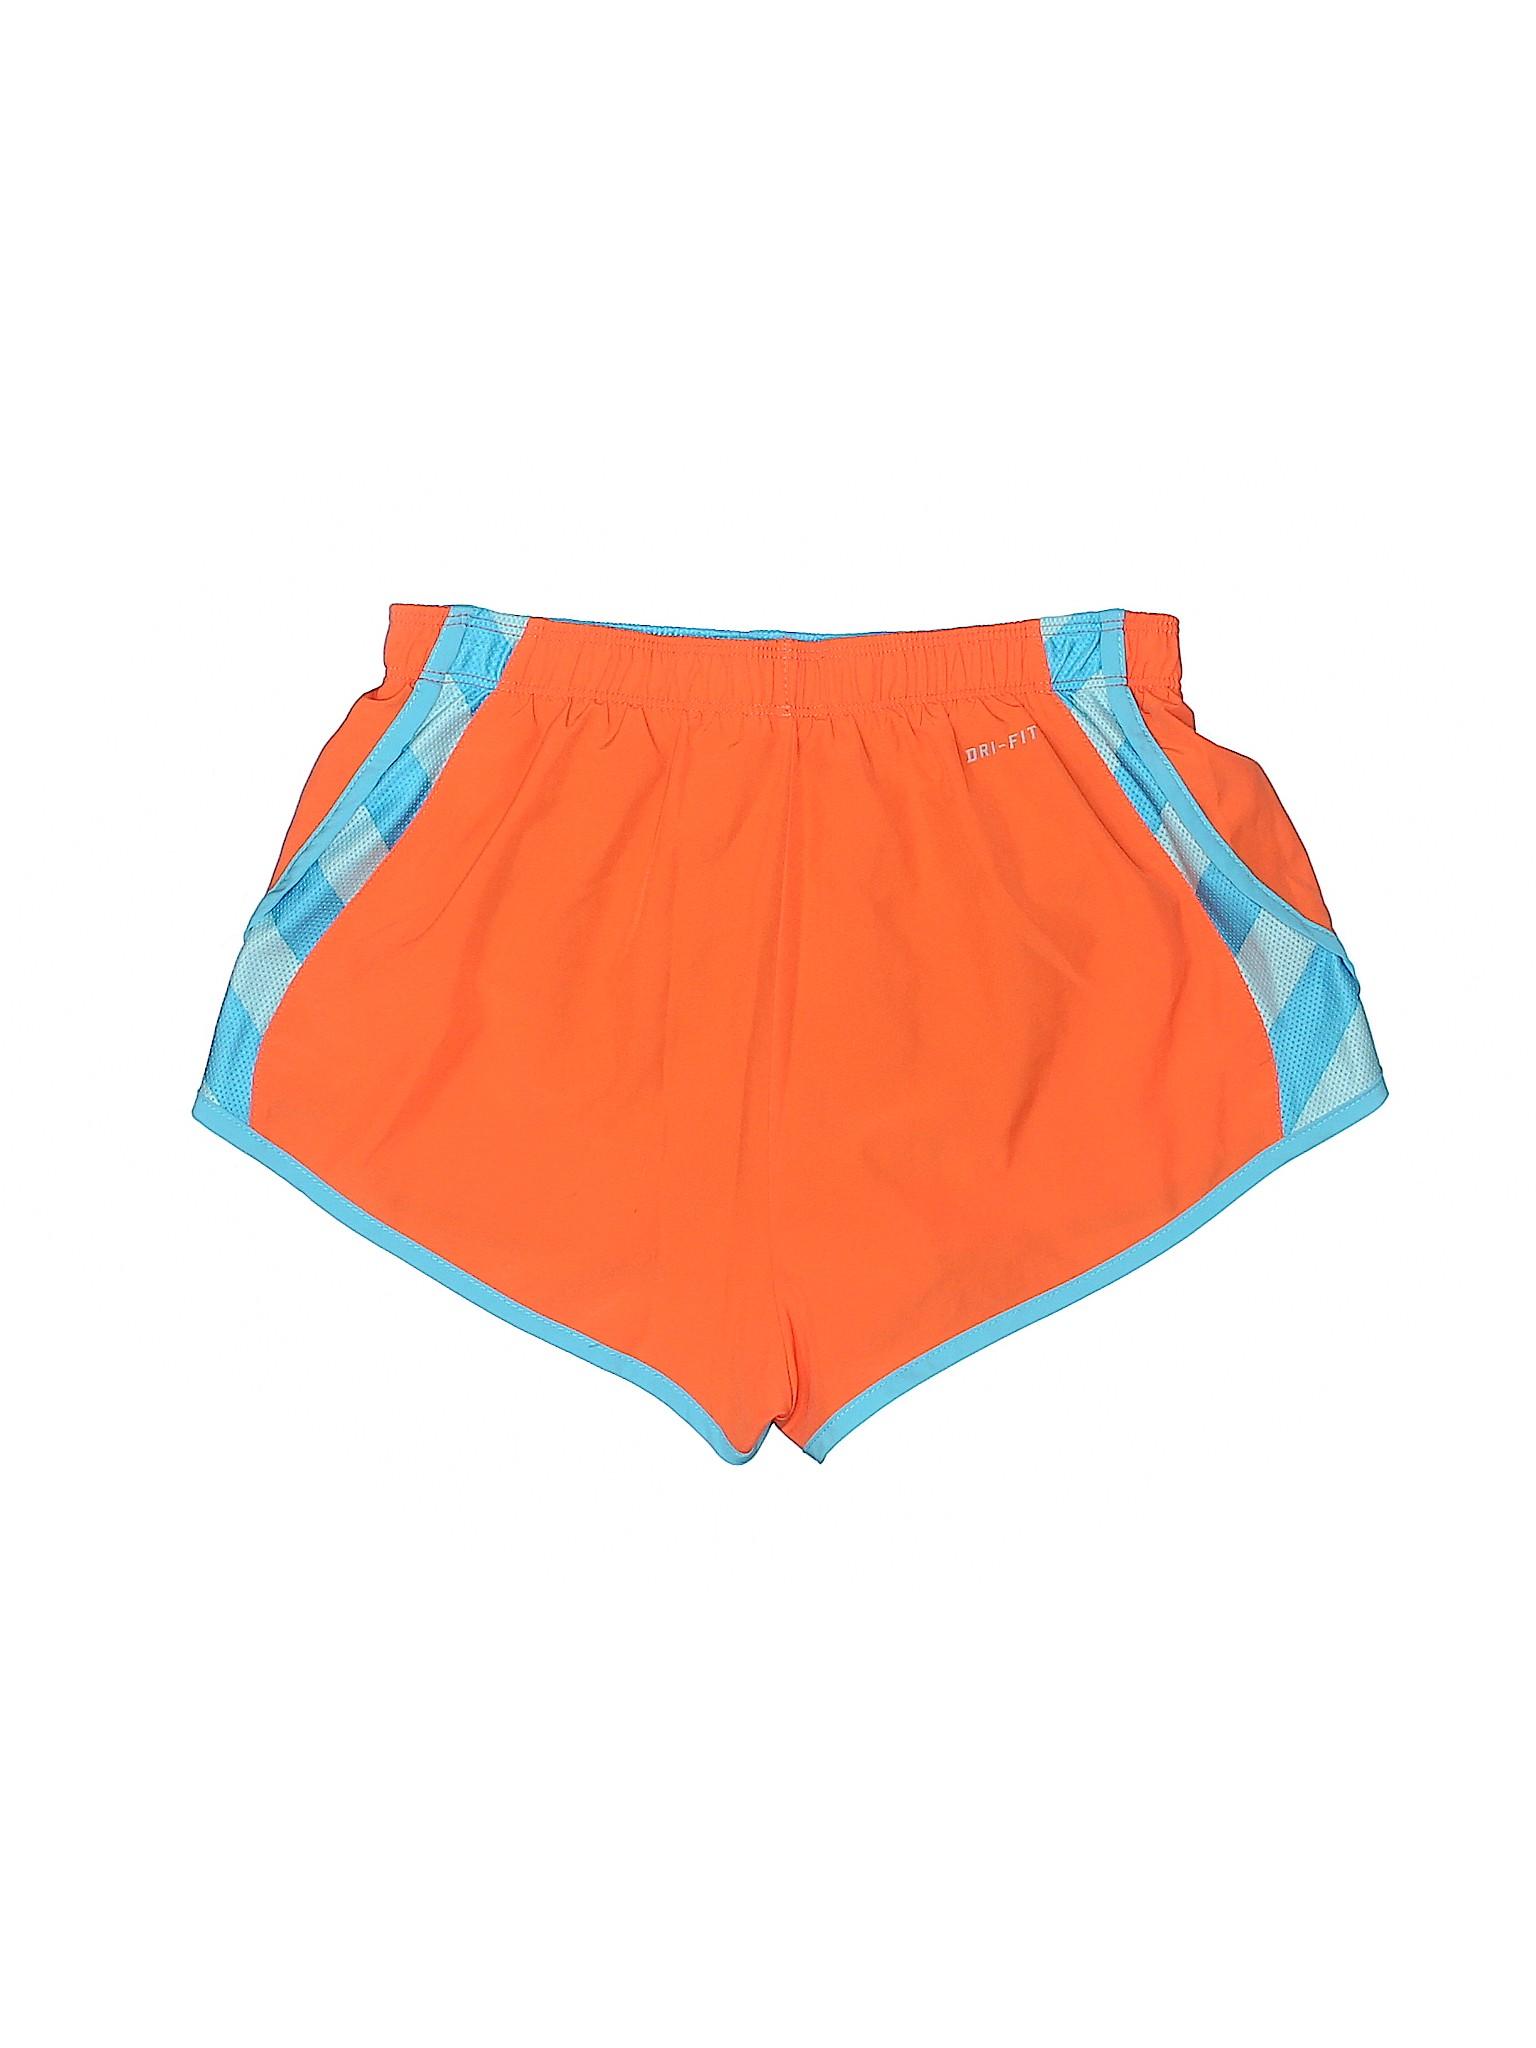 Boutique Boutique Boutique Shorts Athletic Nike Shorts Nike Athletic Fqwrz5F